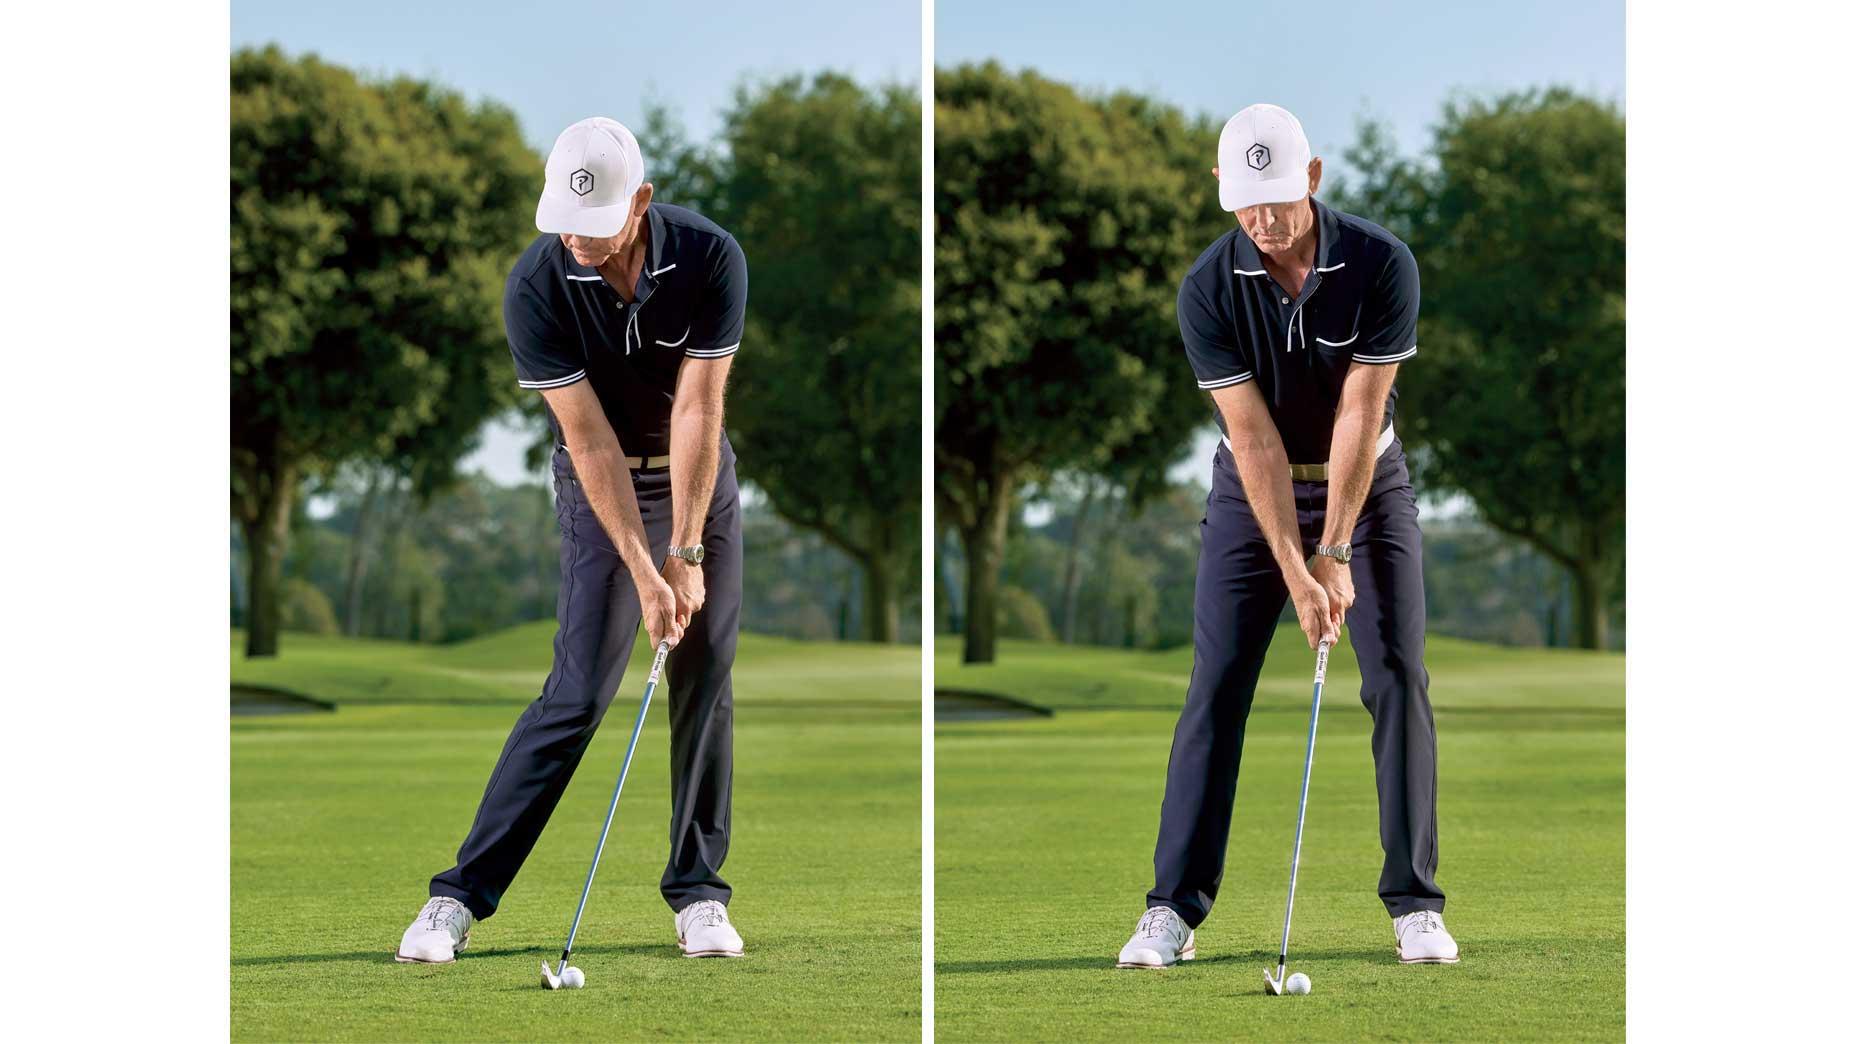 man swings golf club